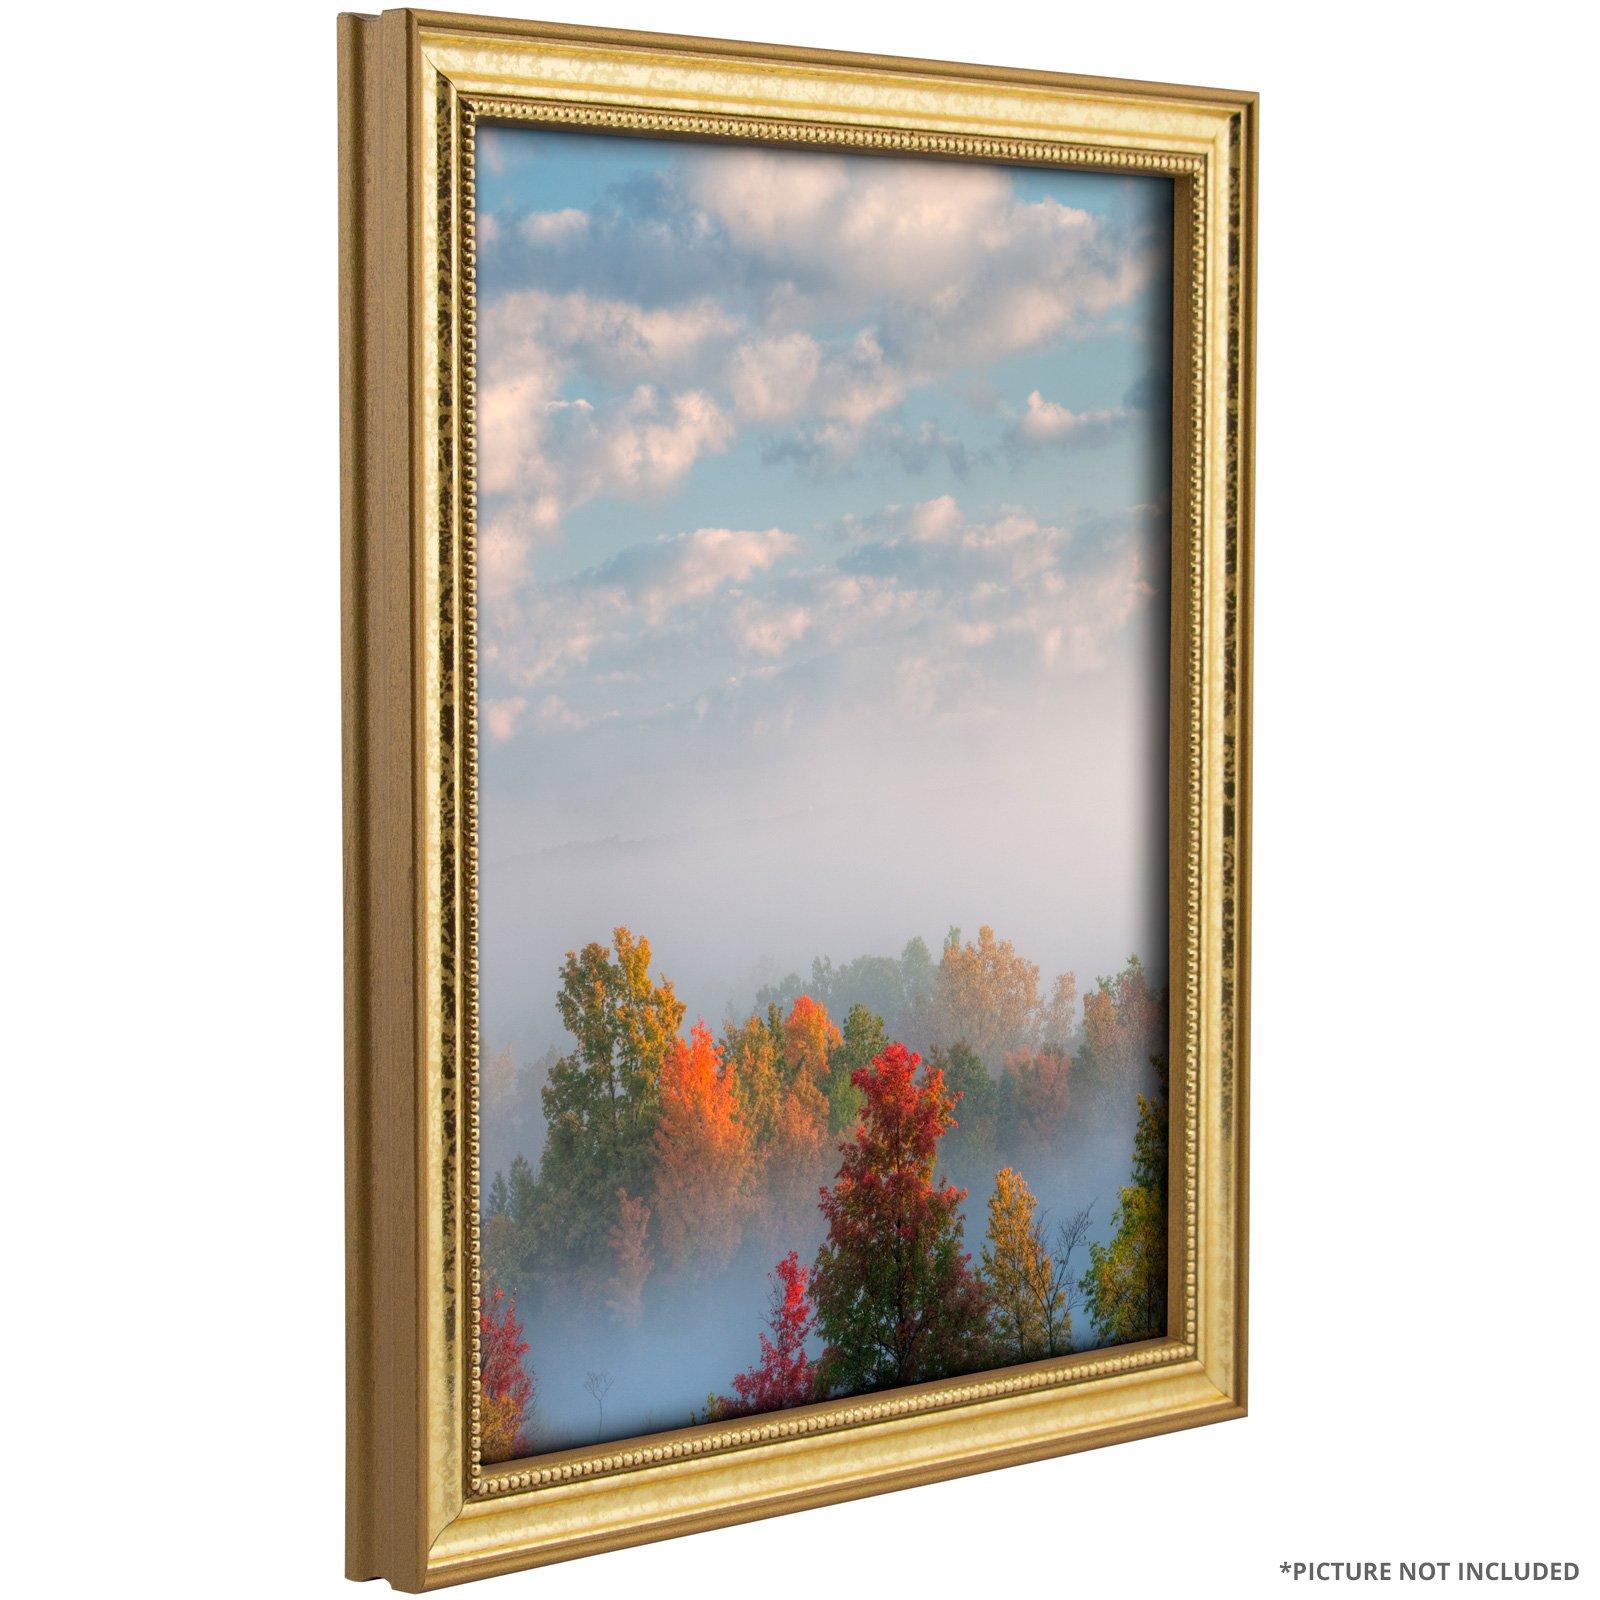 Craig Frames 314GD 24 x 36-Inch Picture Frame, Ornate Finish, 0.75-Inch Wide, Ornate Gold by Craig Frames (Image #4)